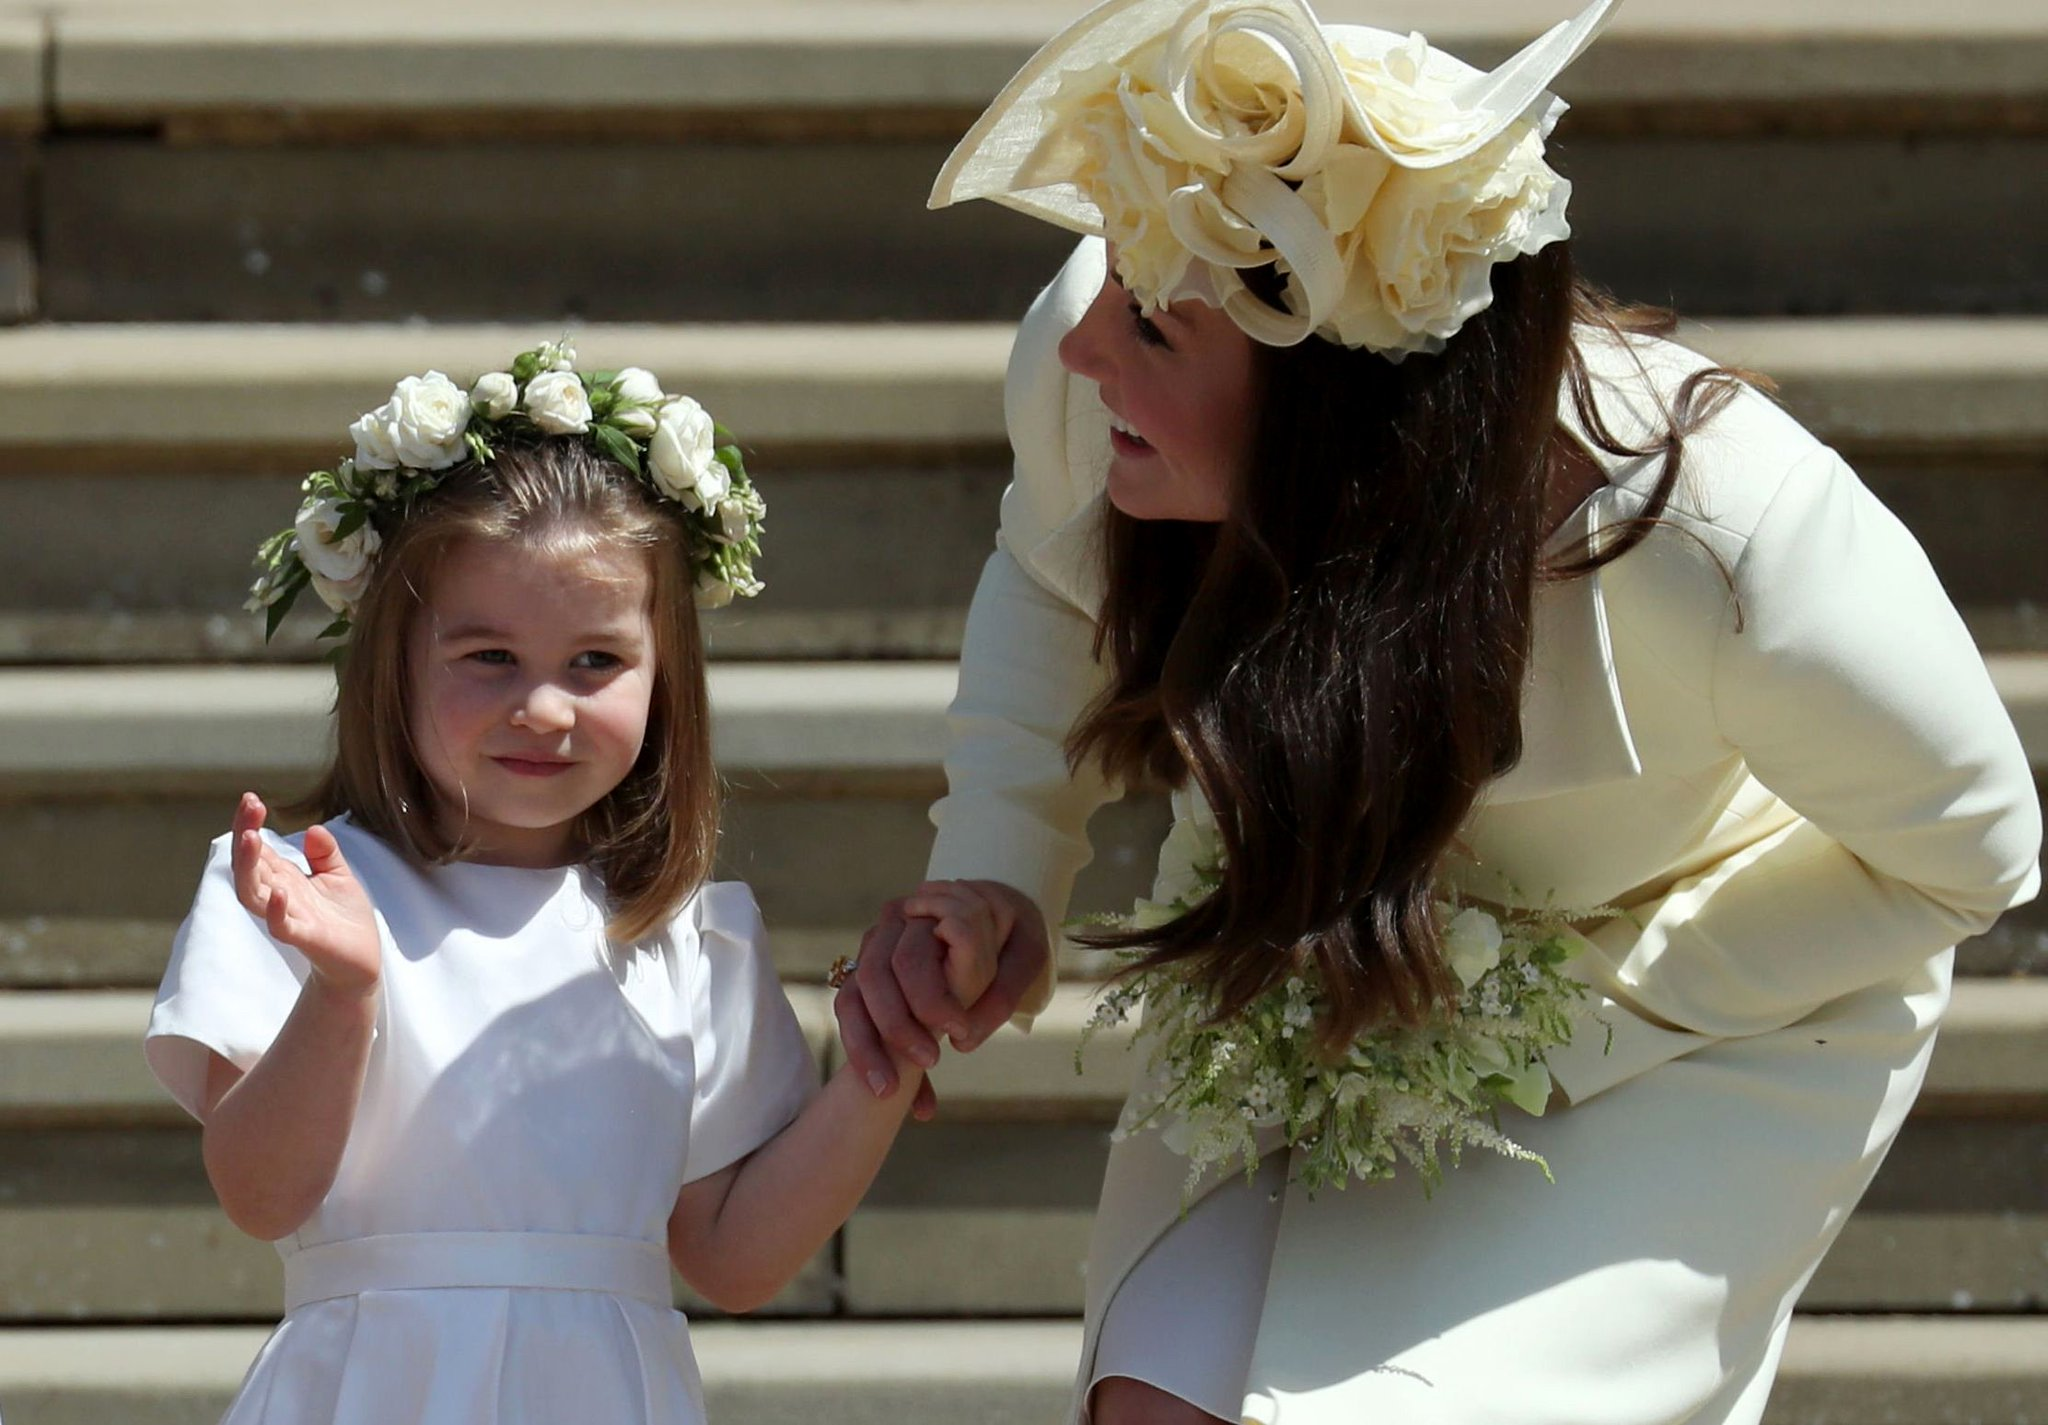 PRINCE GEORGE. PRINCESS CHARLOTTE. CUTENESS OVERLOAD. #RoyalWedding   https://t.co/NHAURckPc4 https://t.co/N1T6fJhDtu